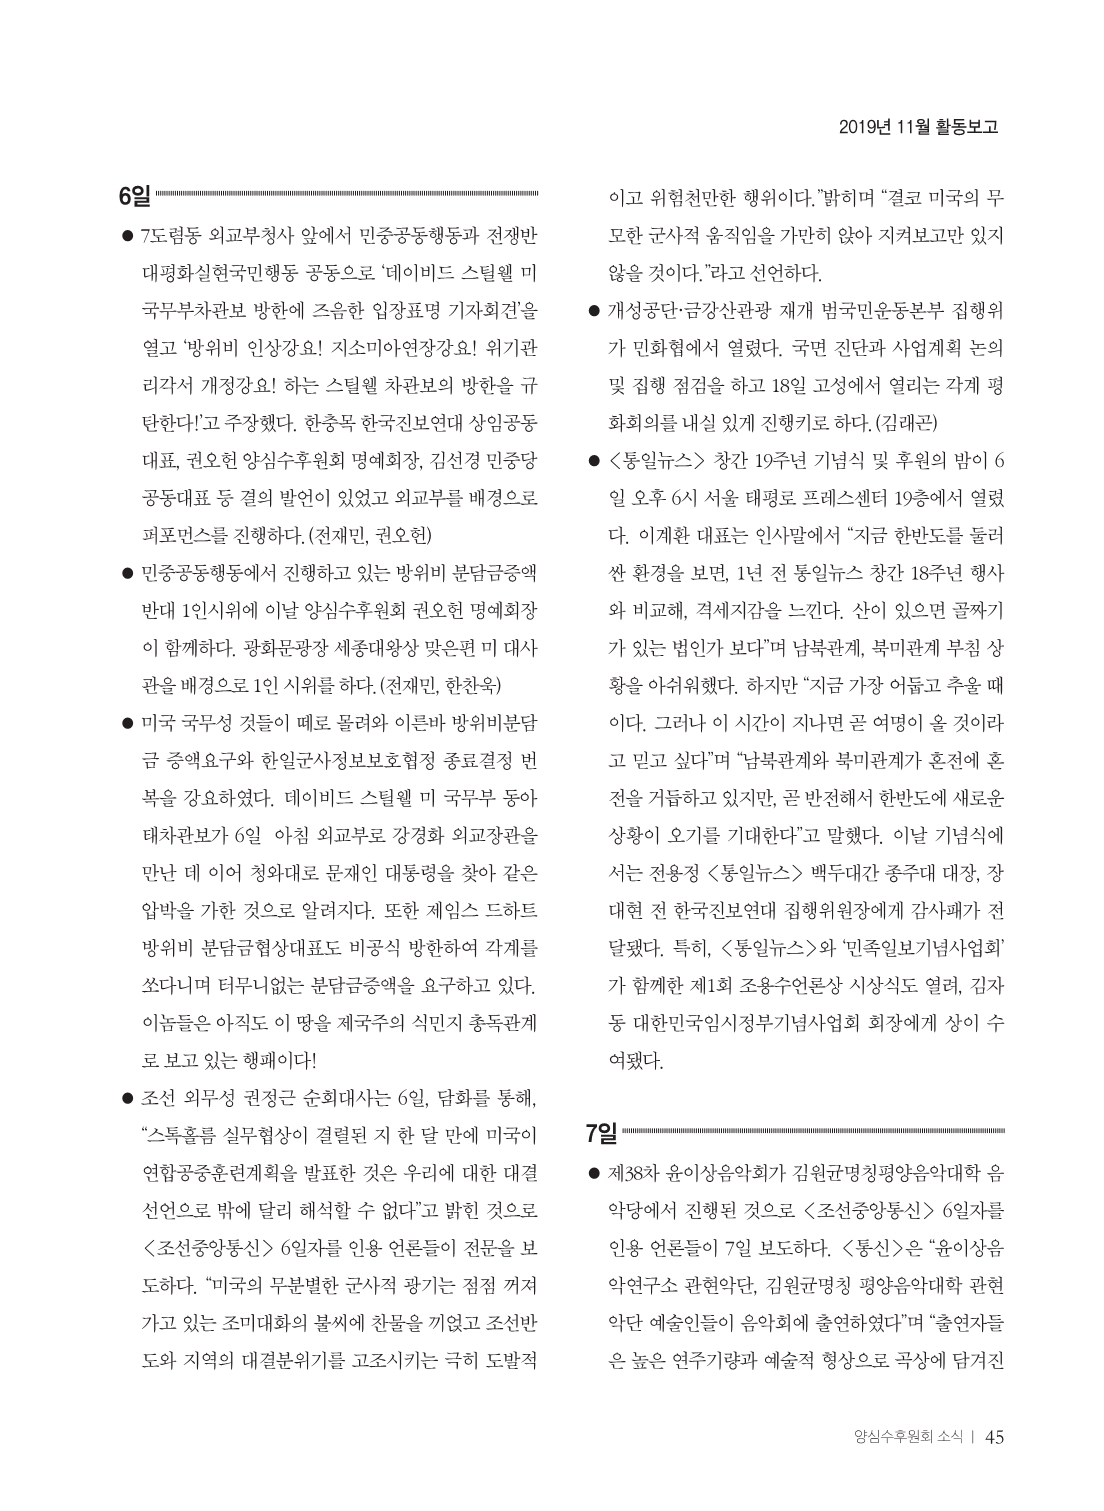 5802db1f-6a90-451c-ac2e-da2a23bee939.pdf-0047.jpg